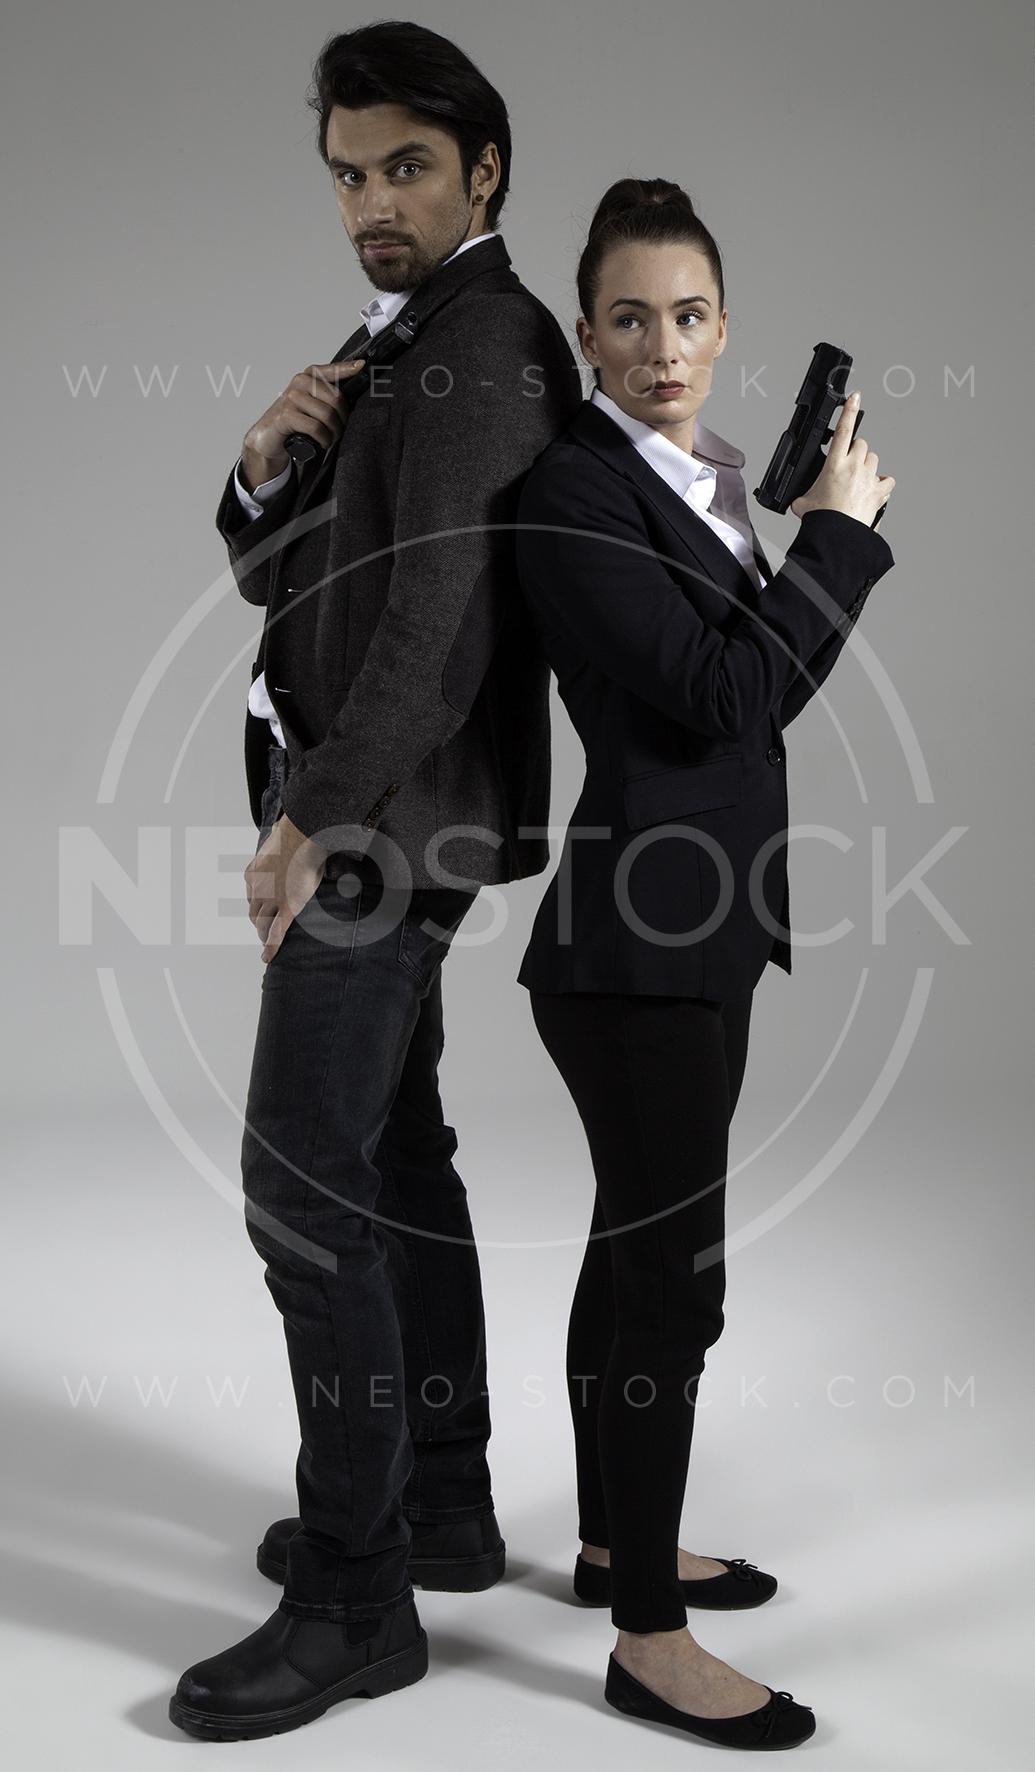 NeoStock - Cop Drama Duo - Stock Photography IV